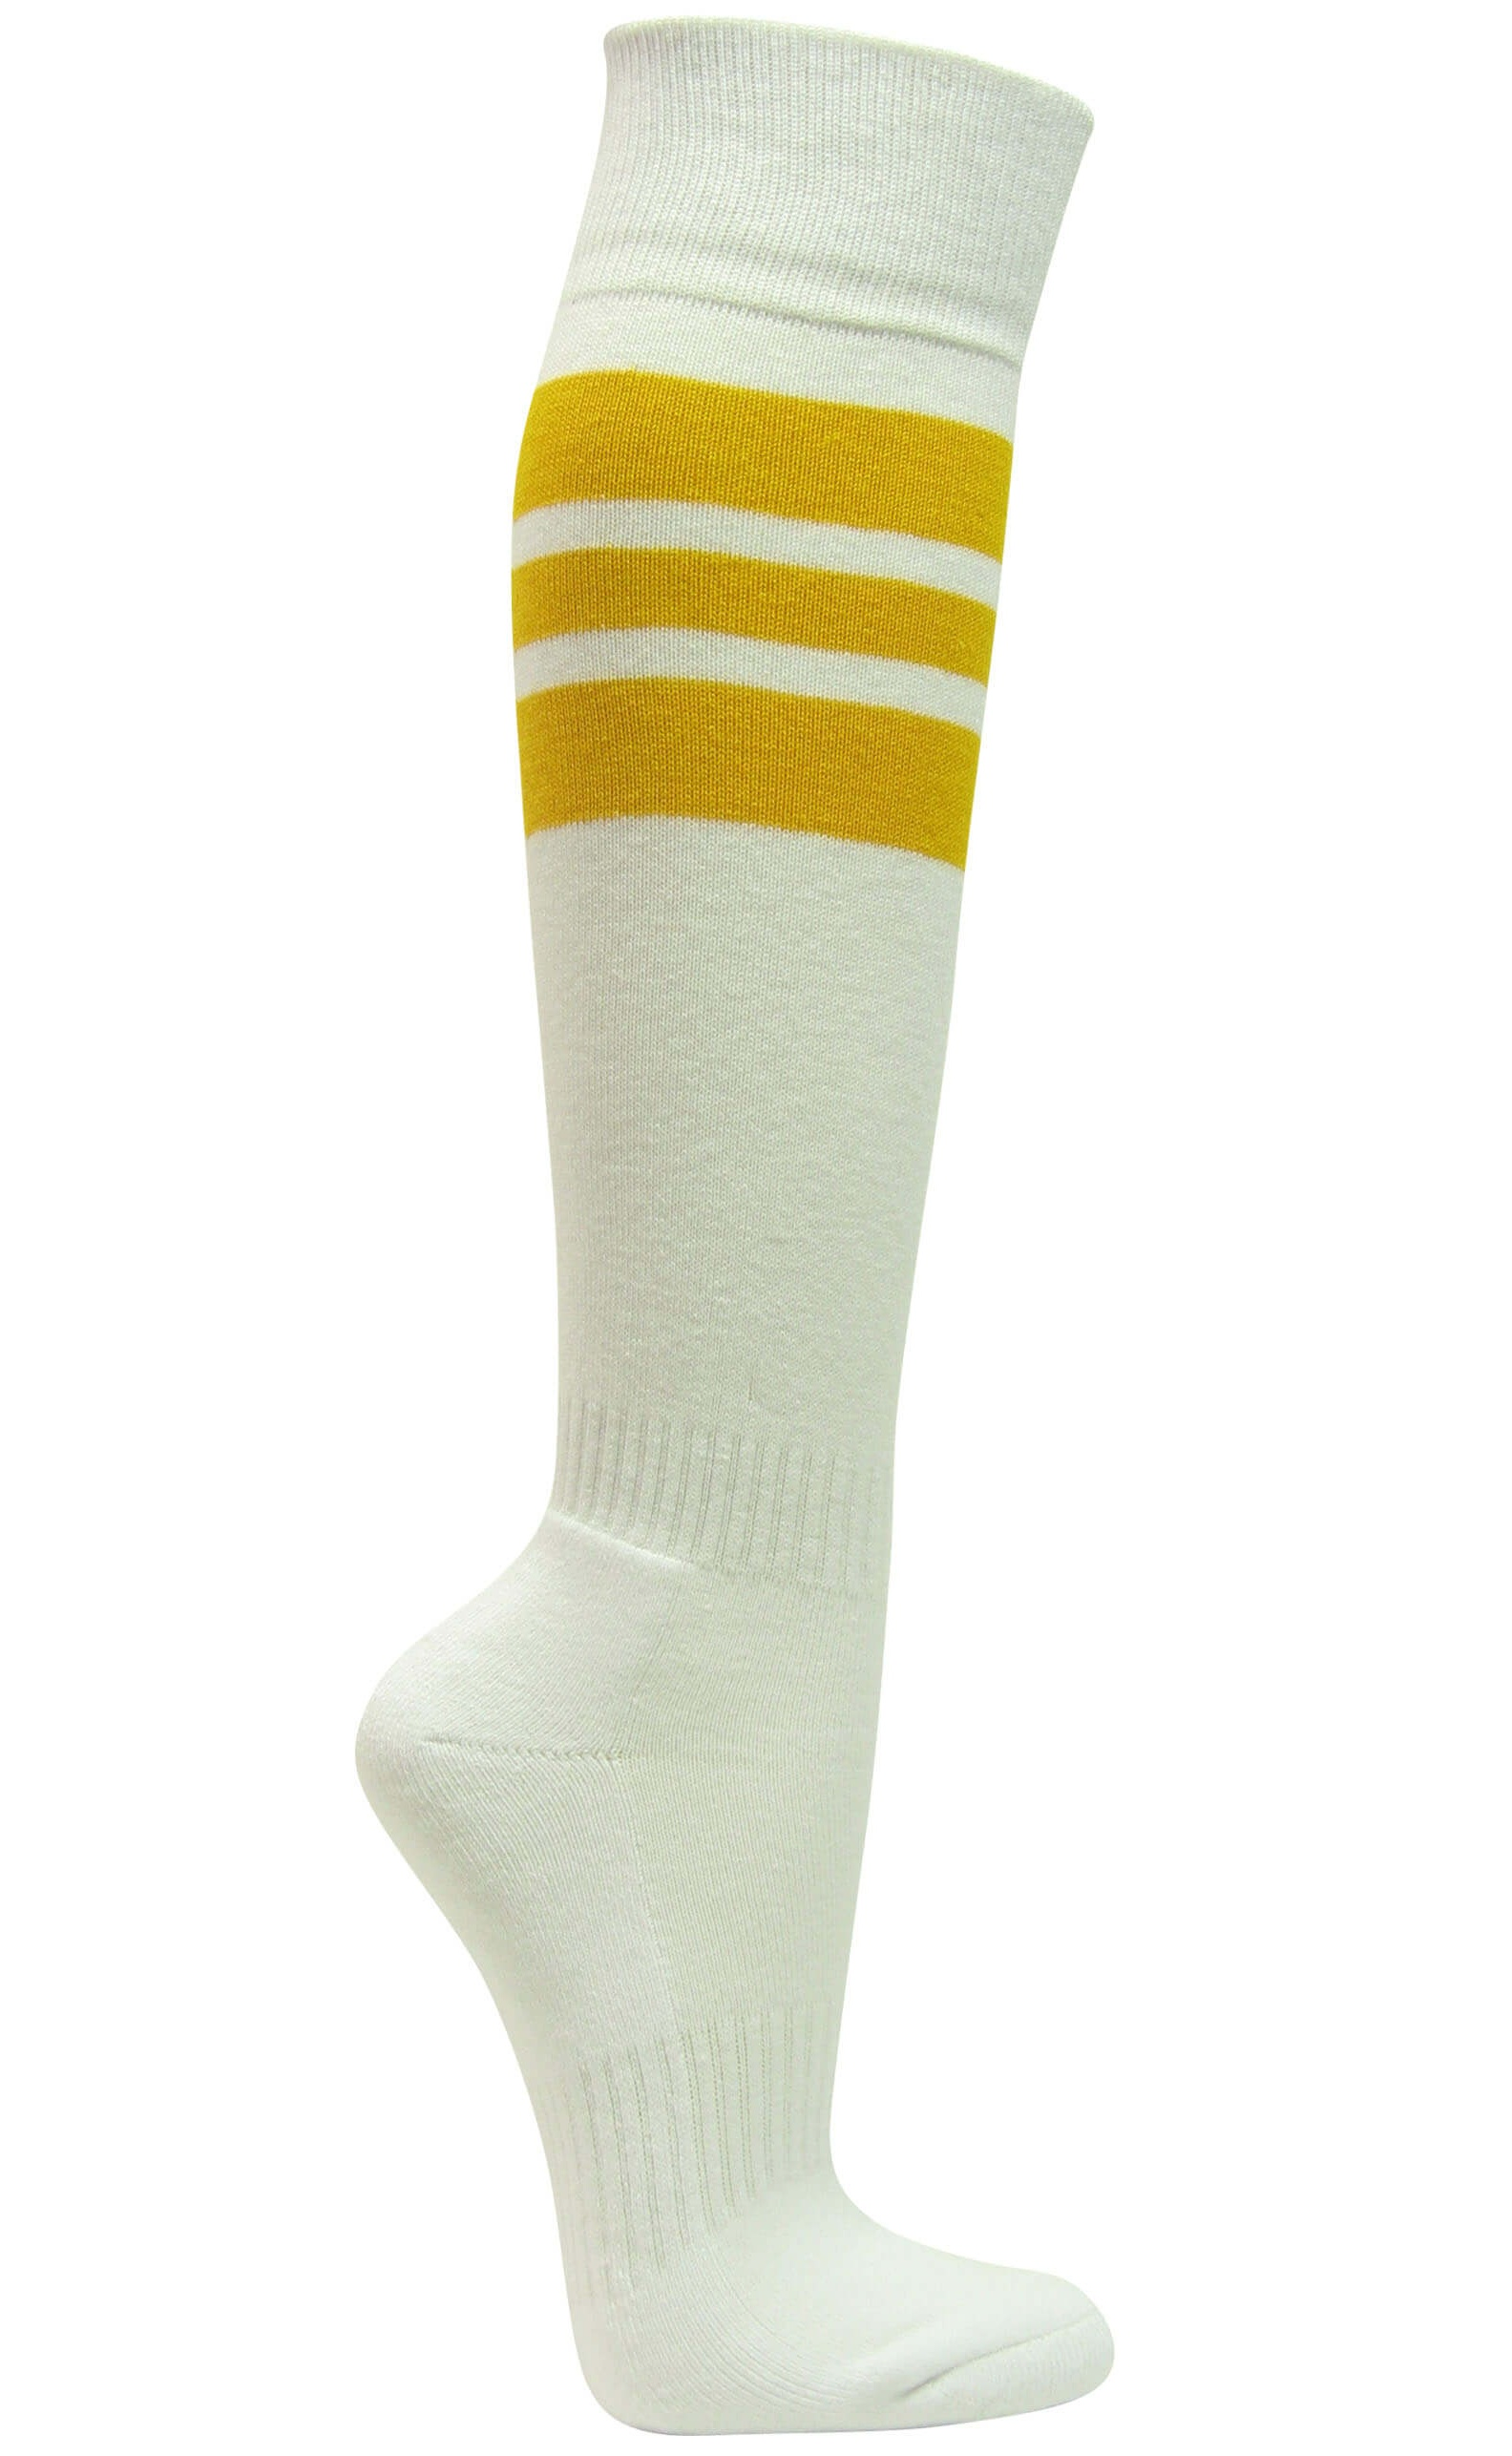 06926166f Couver Premium Quality White Triple Stripe Baseball Softball Athletic Tube  Knee High Socks